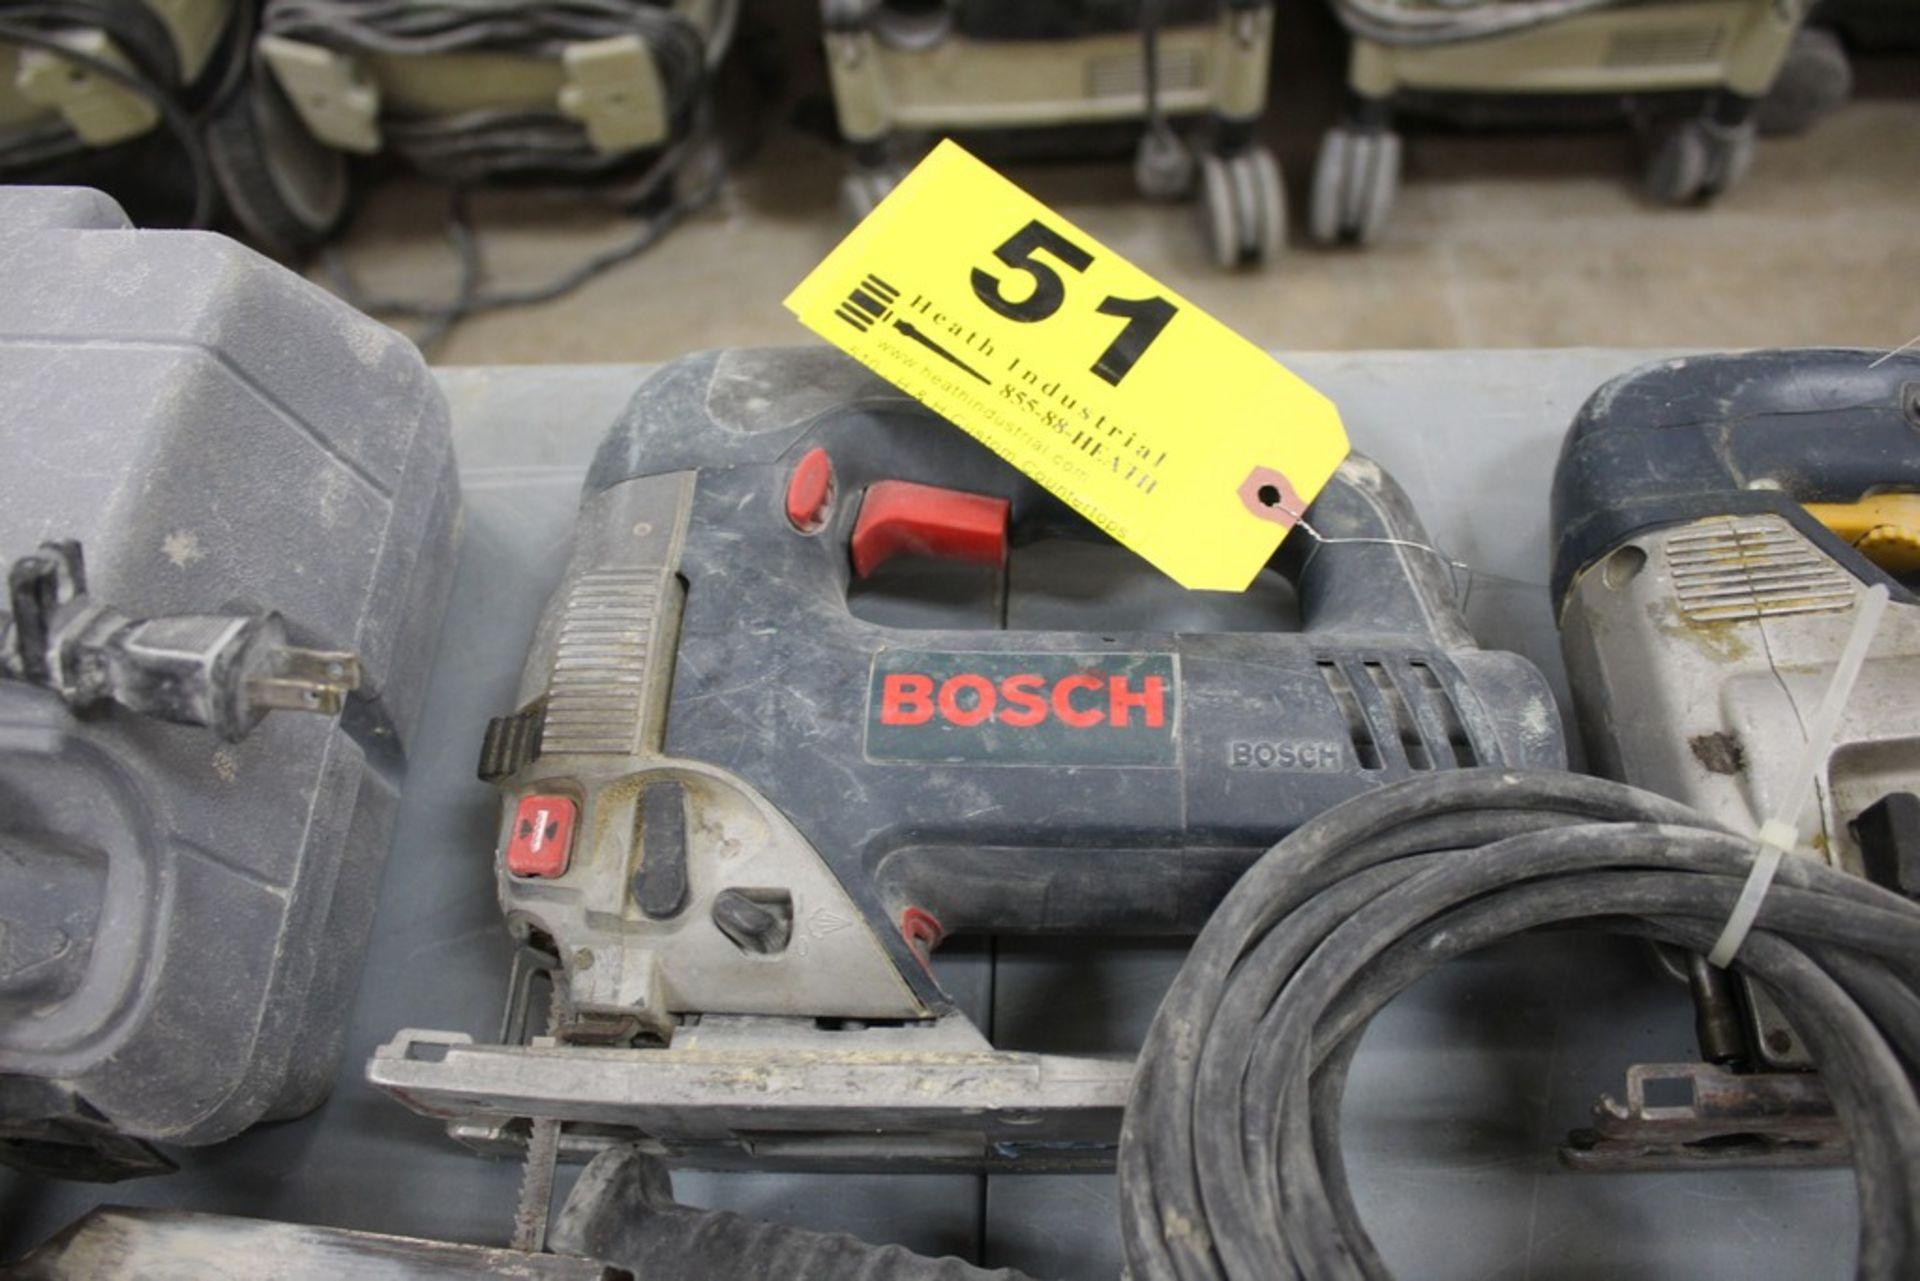 Lot 51 - BOSCH MODEL 1590 EVS ELECTRIC JIG SAW